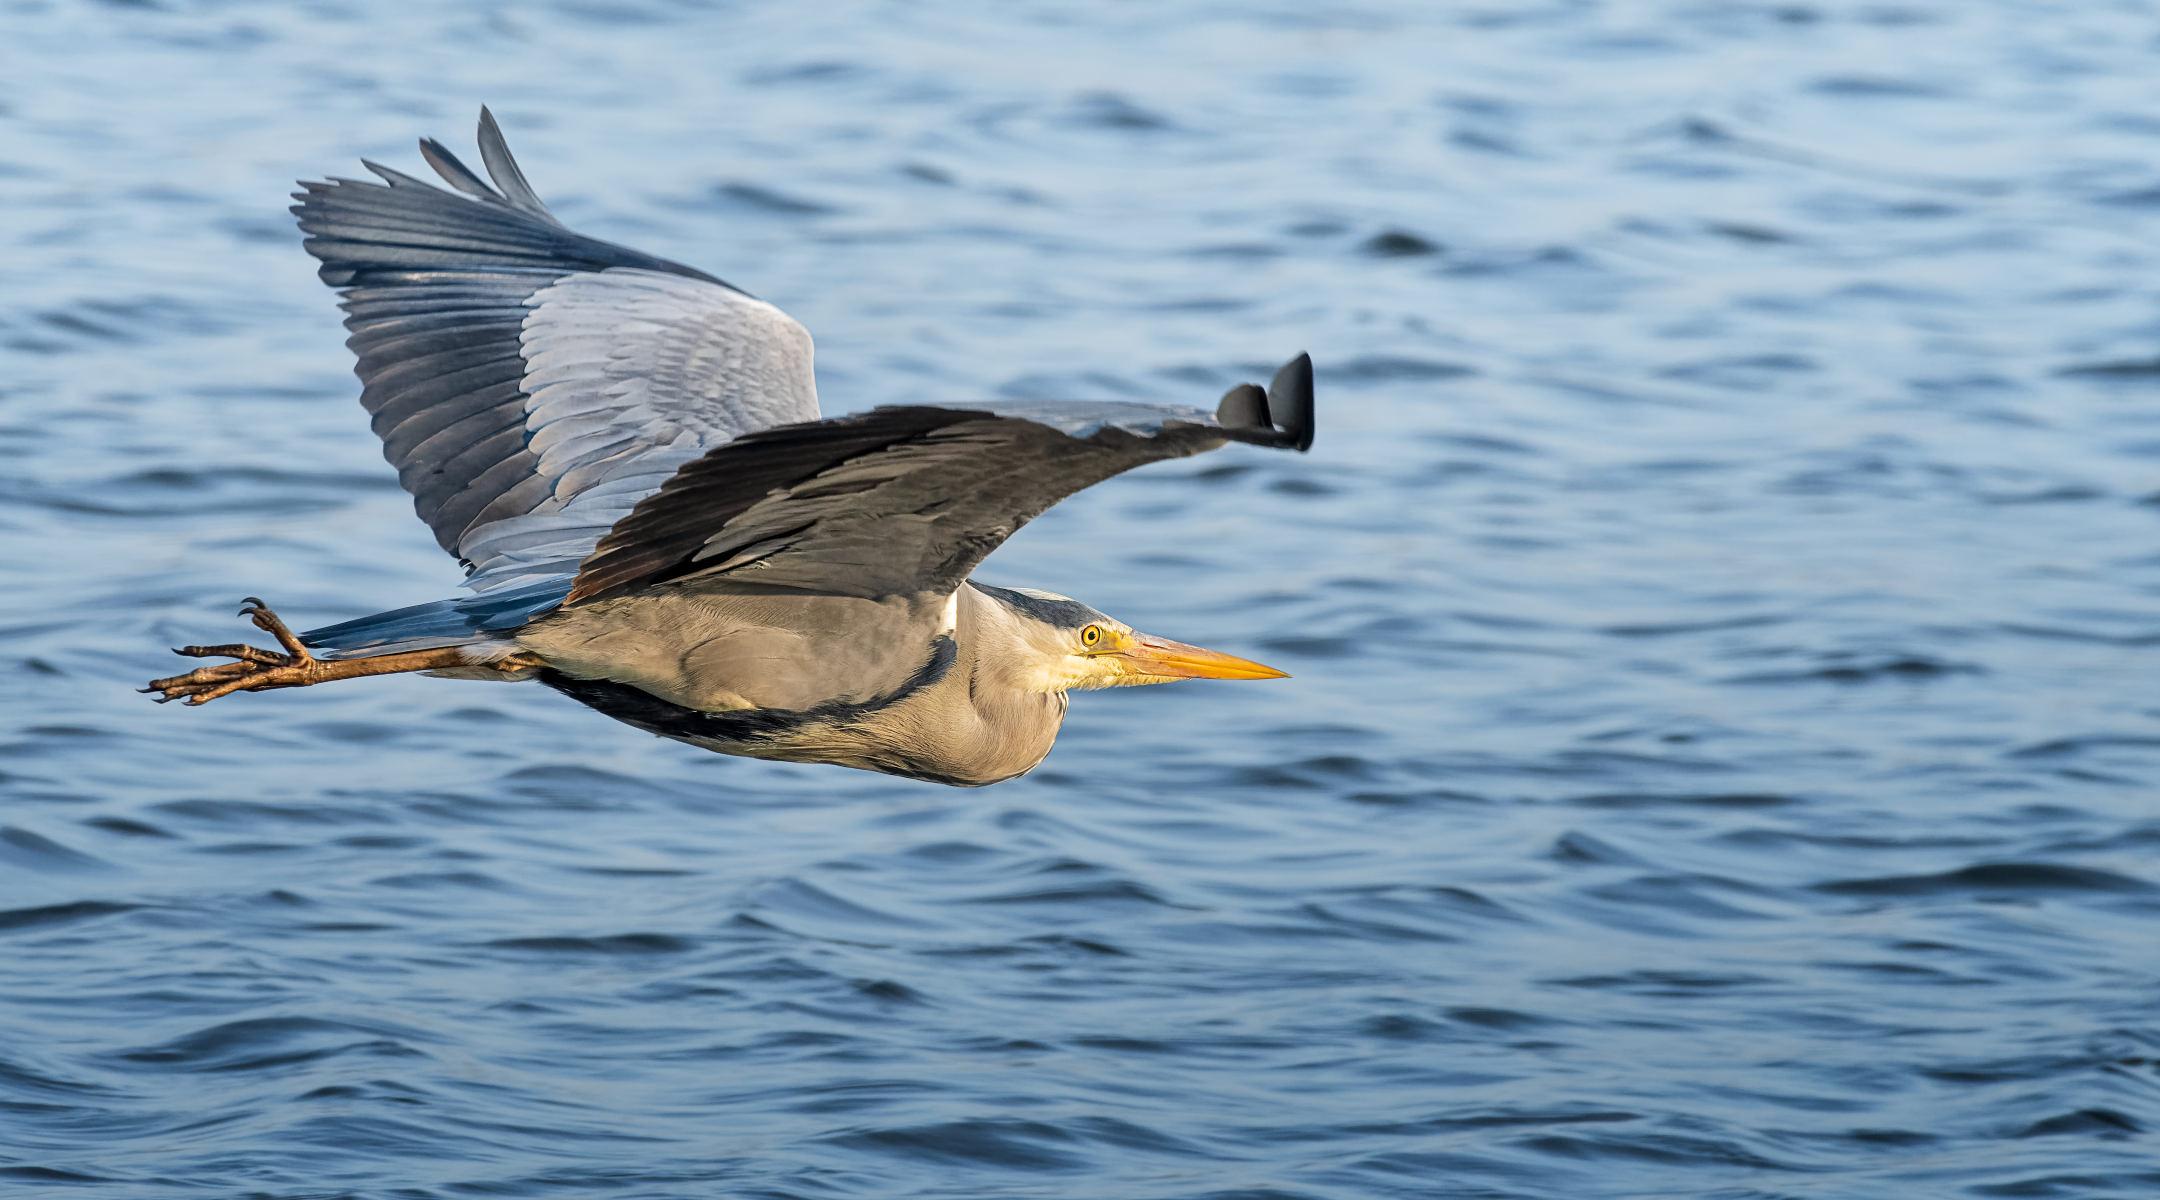 grey heron skimming over the water